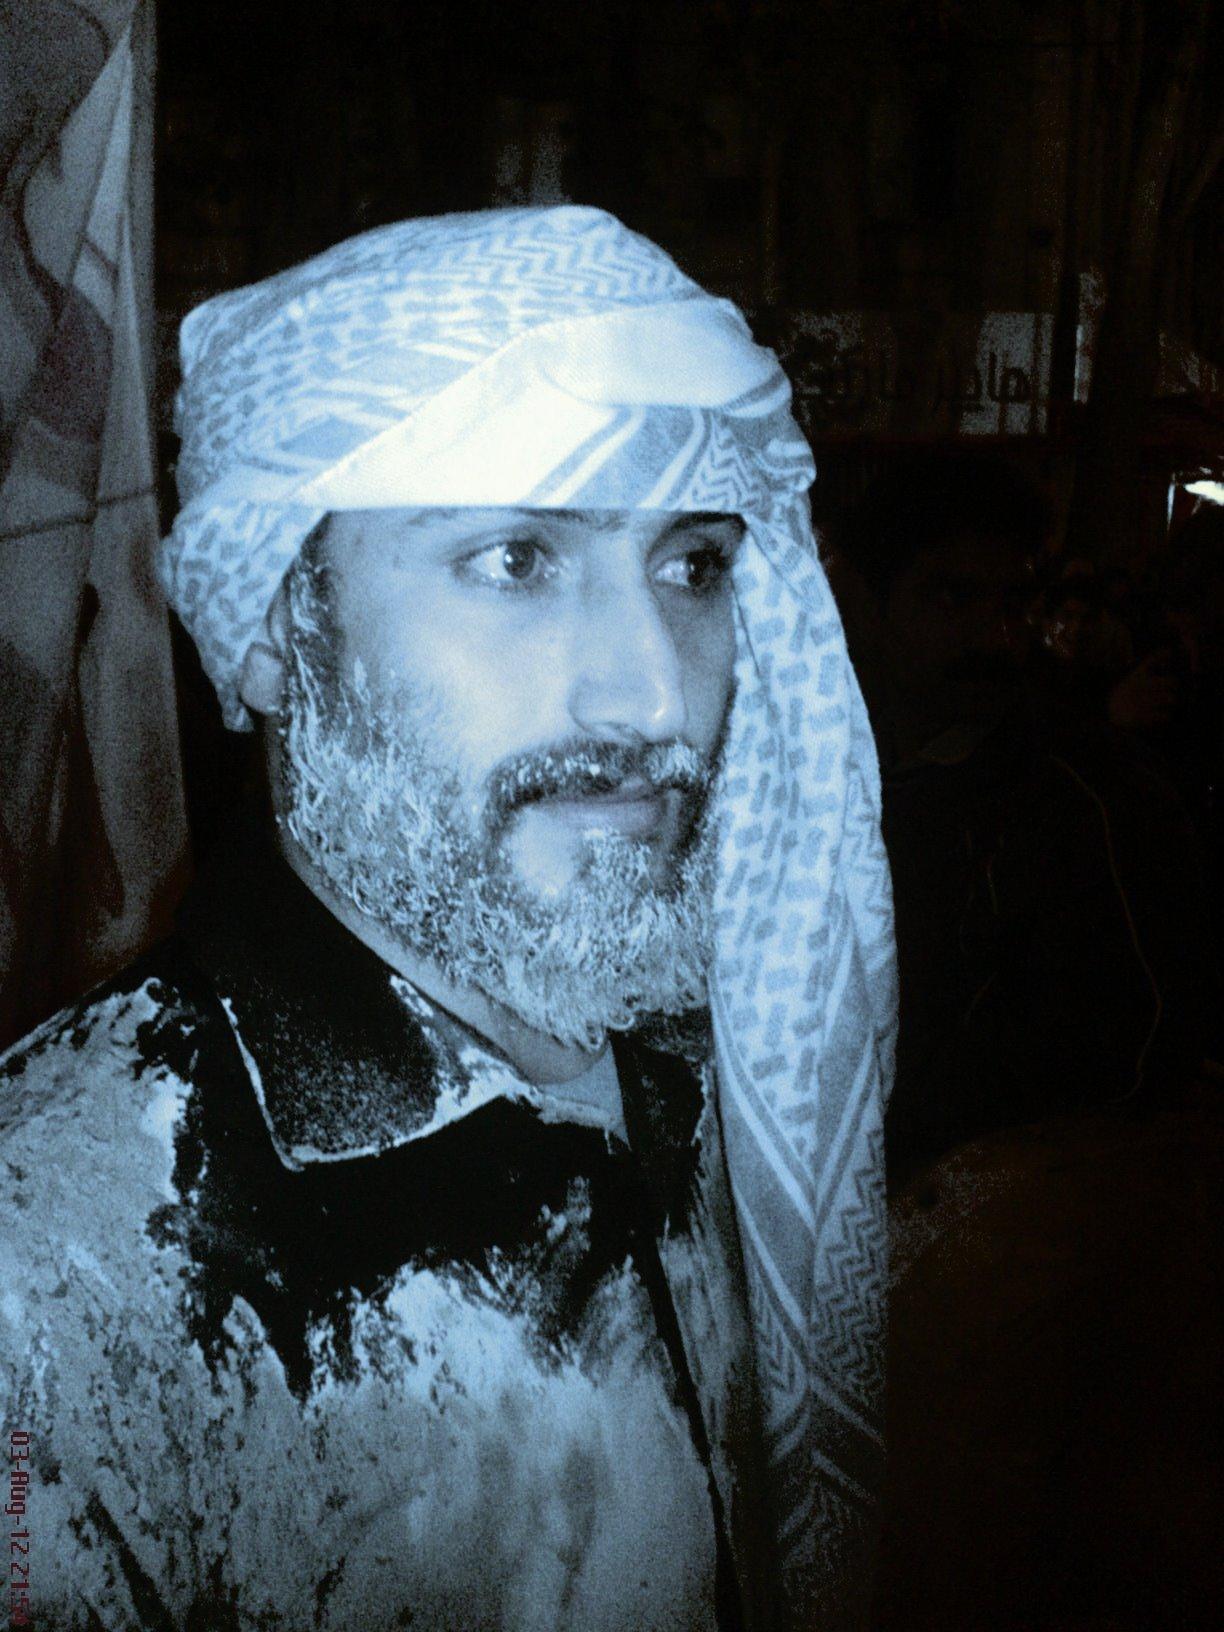 ذاکر اهل بیت سید سجاد موسوی